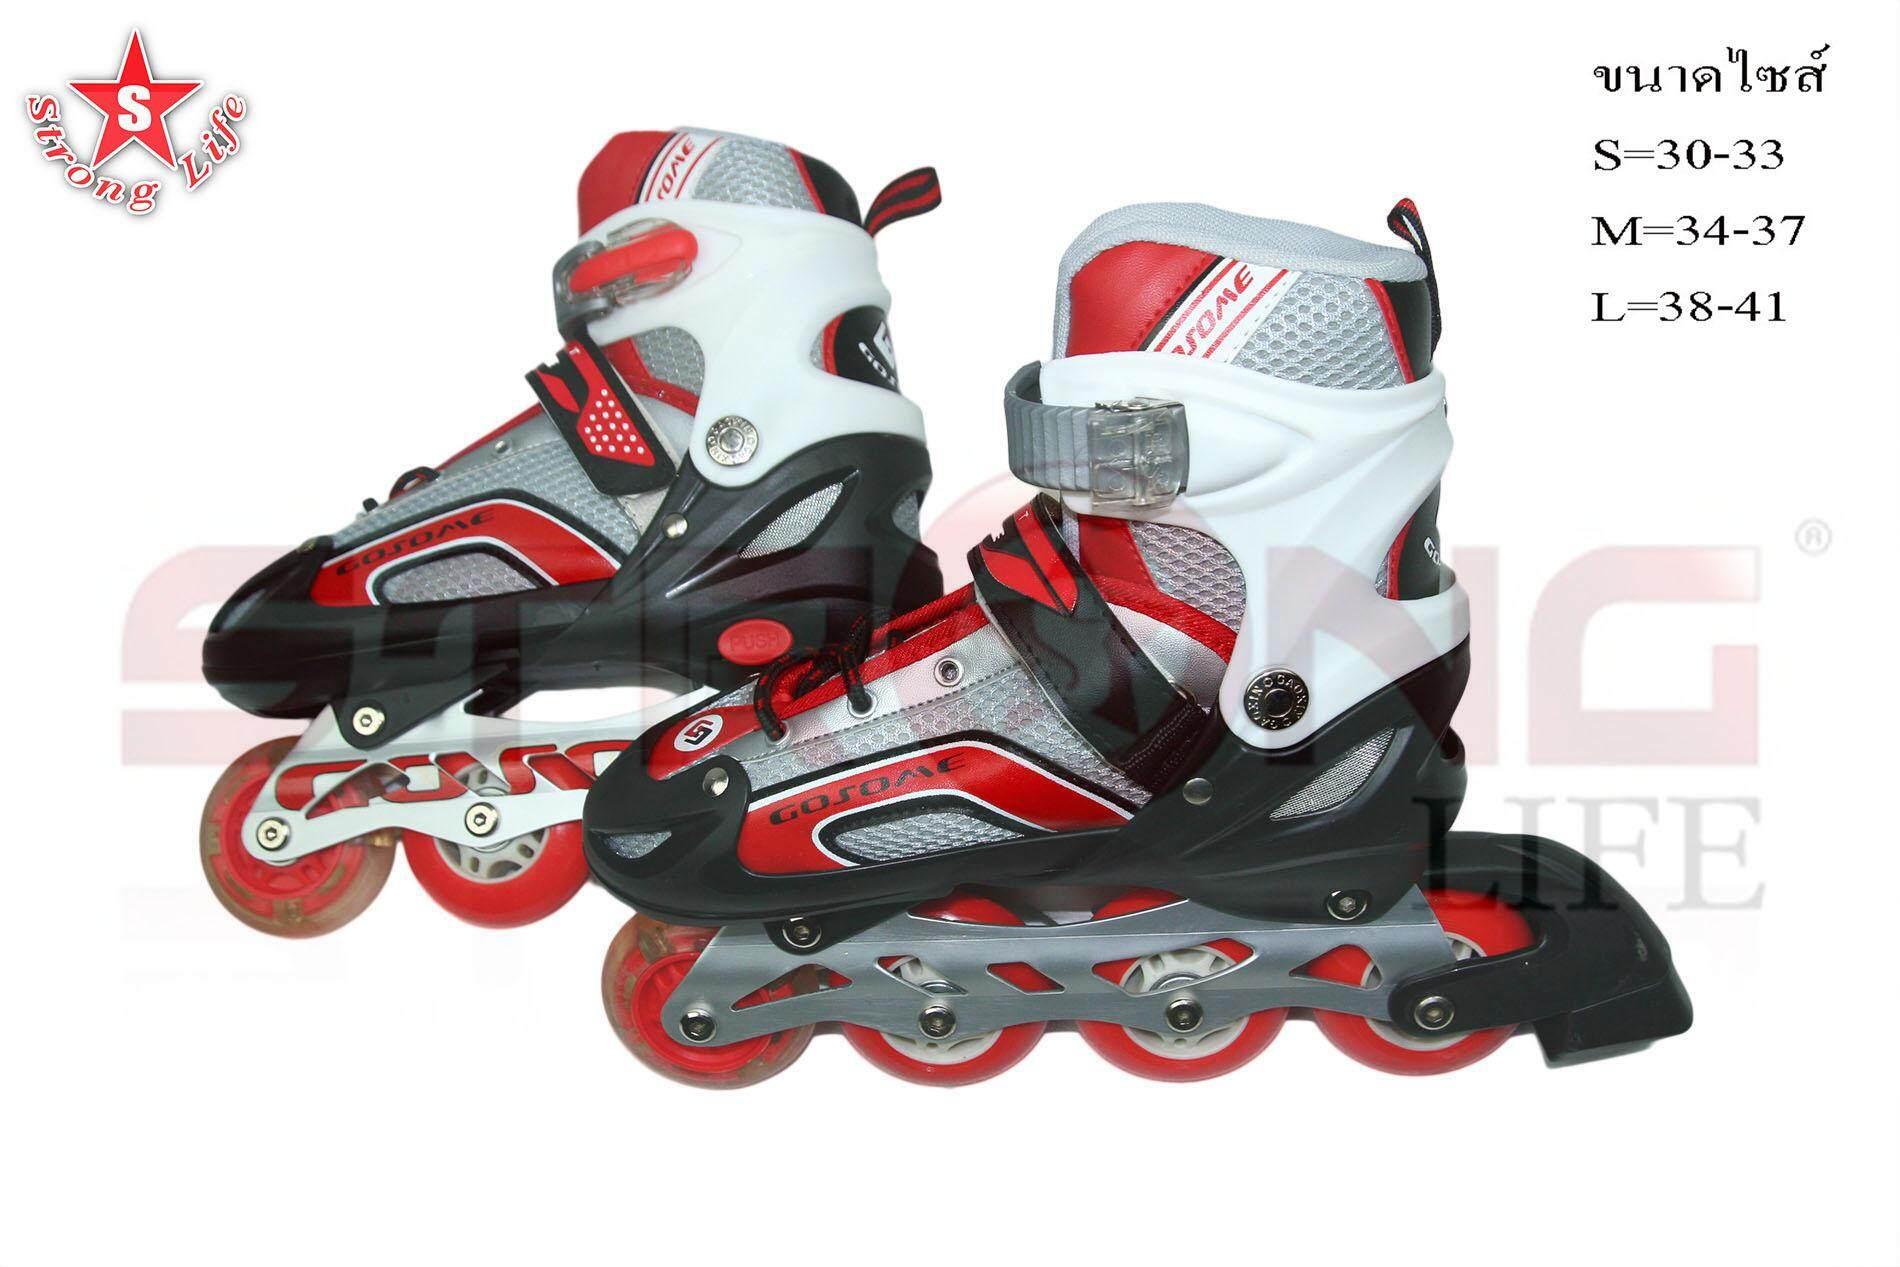 Ska รองเท้าสเก็ต โรลเลอร์เบลด Roller Blade Skate รุ่น Gosome Sk9081 By Ska Sports.